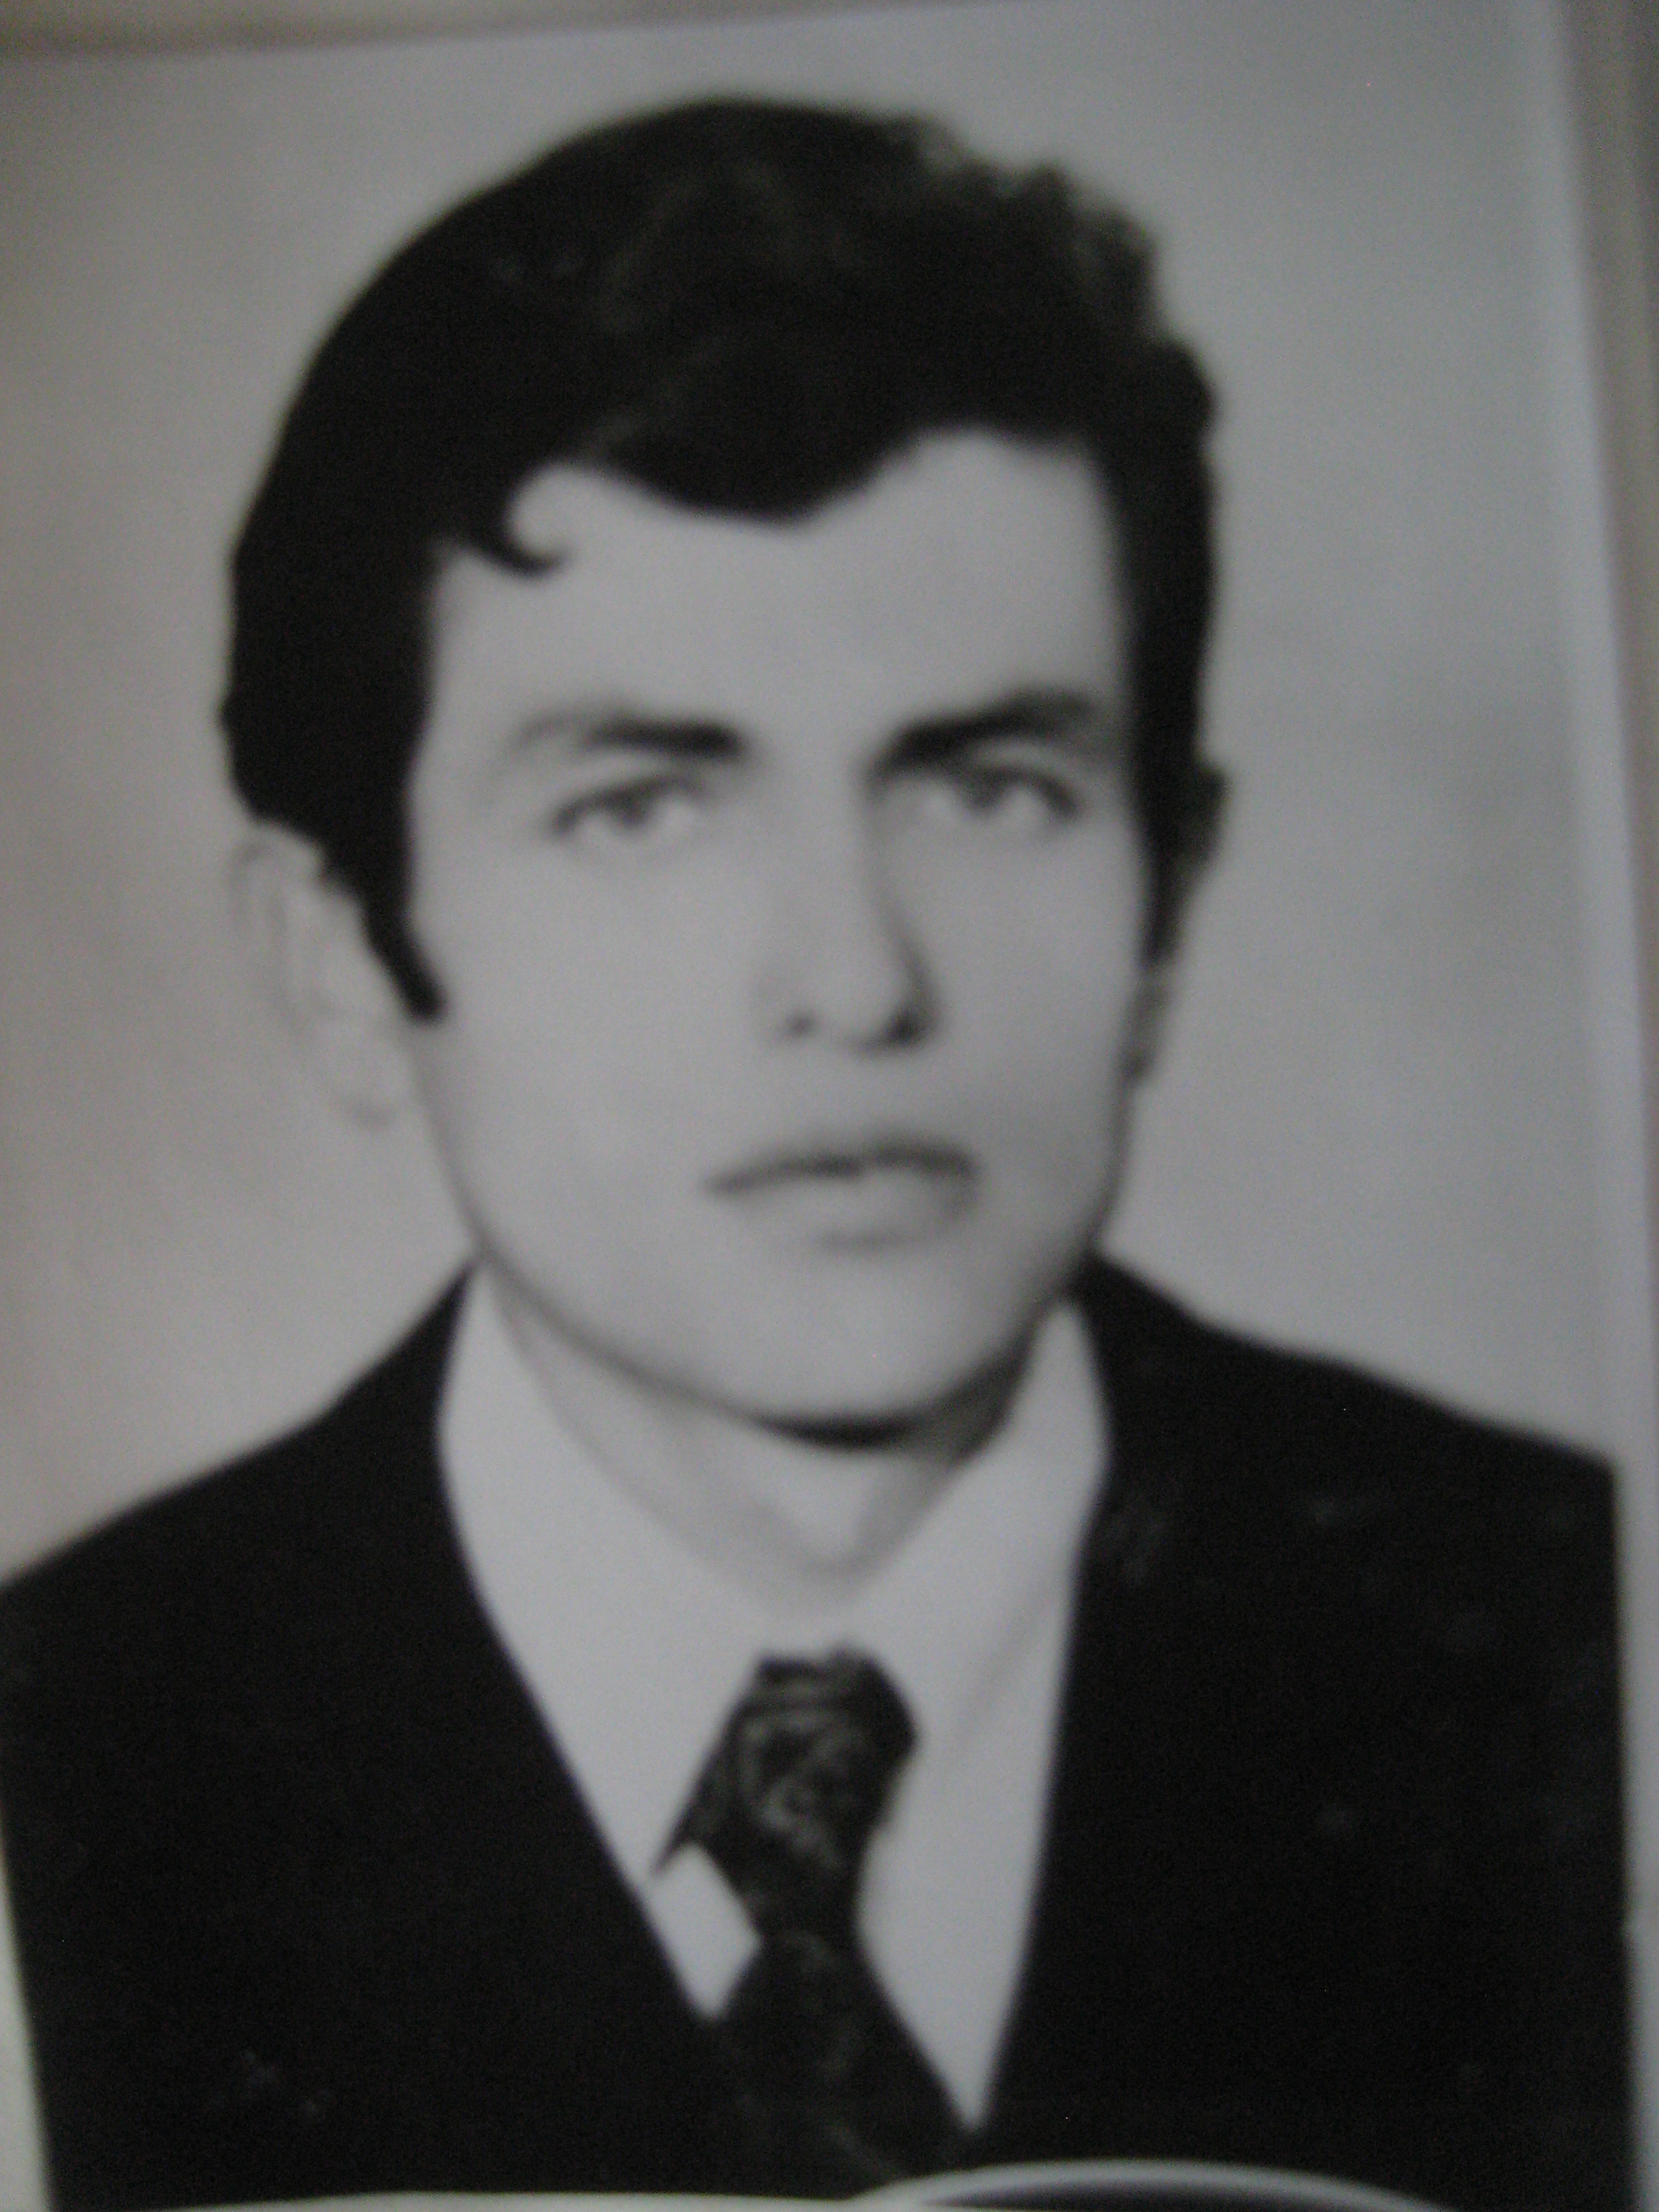 Safi Kılınç